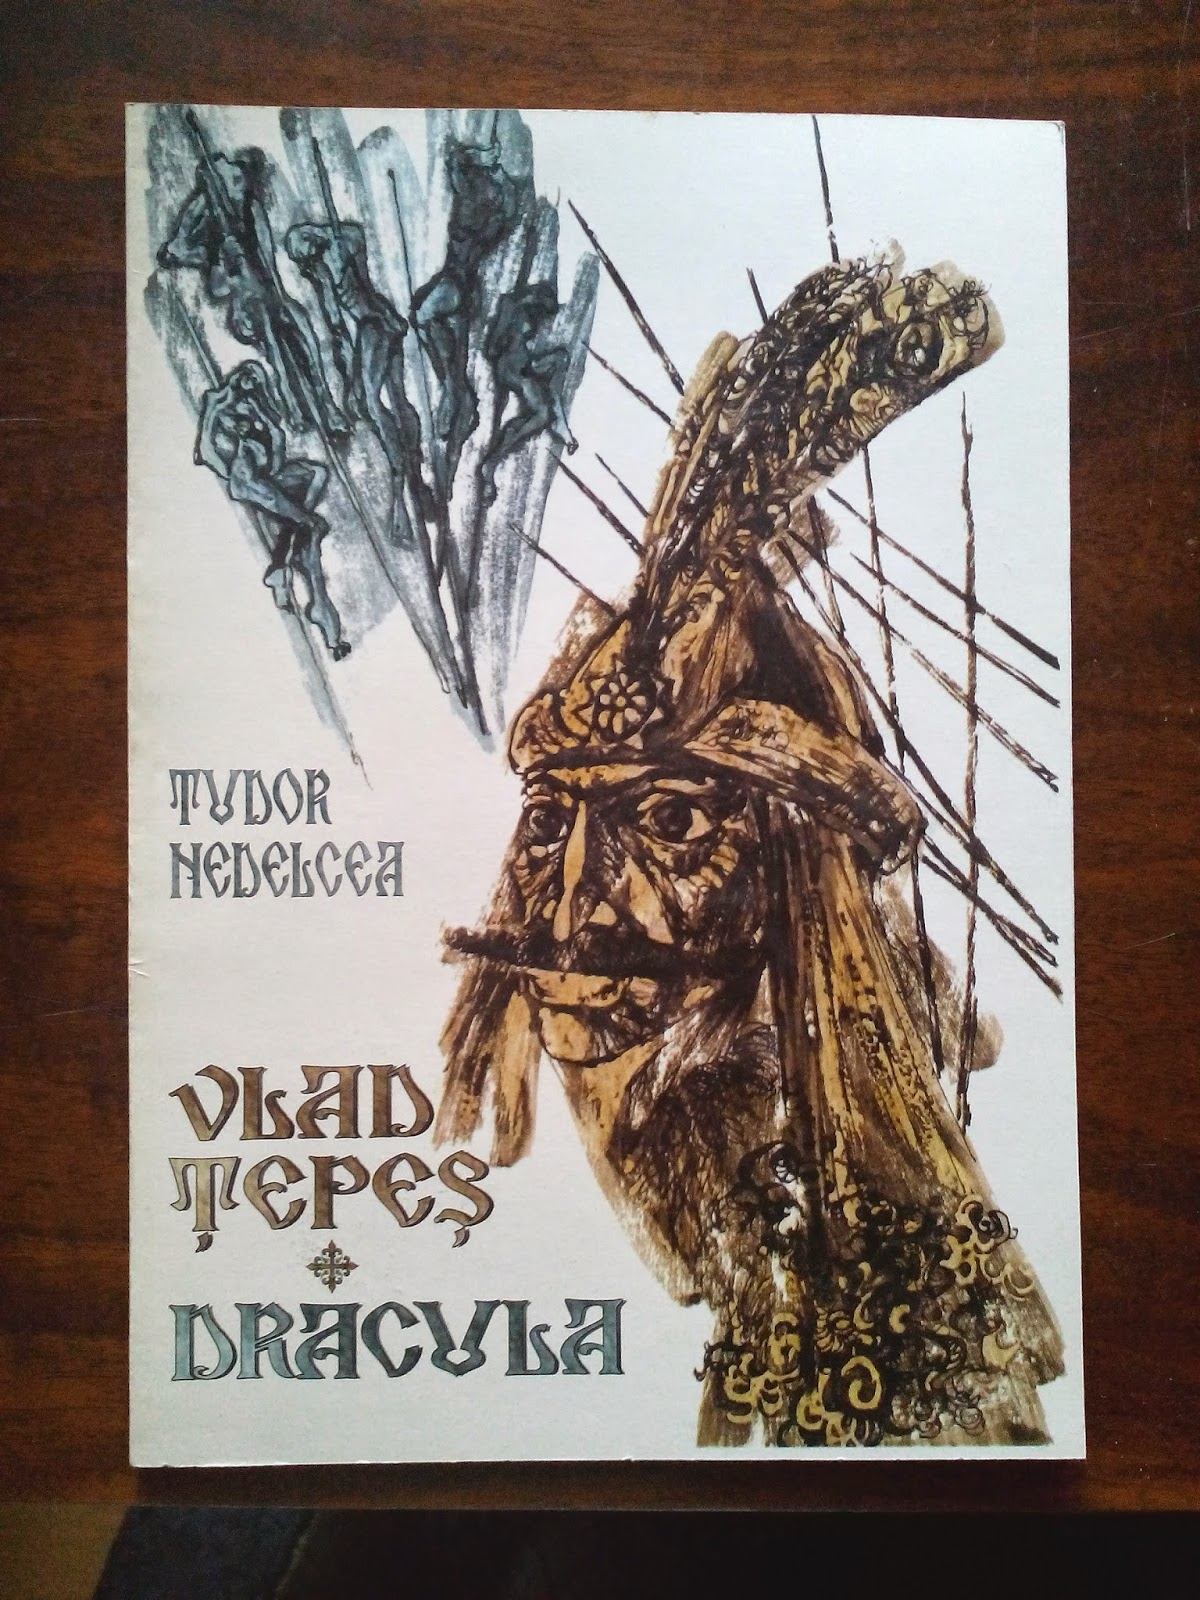 Tudor Nedelcea - Vlad Tepes Dracula